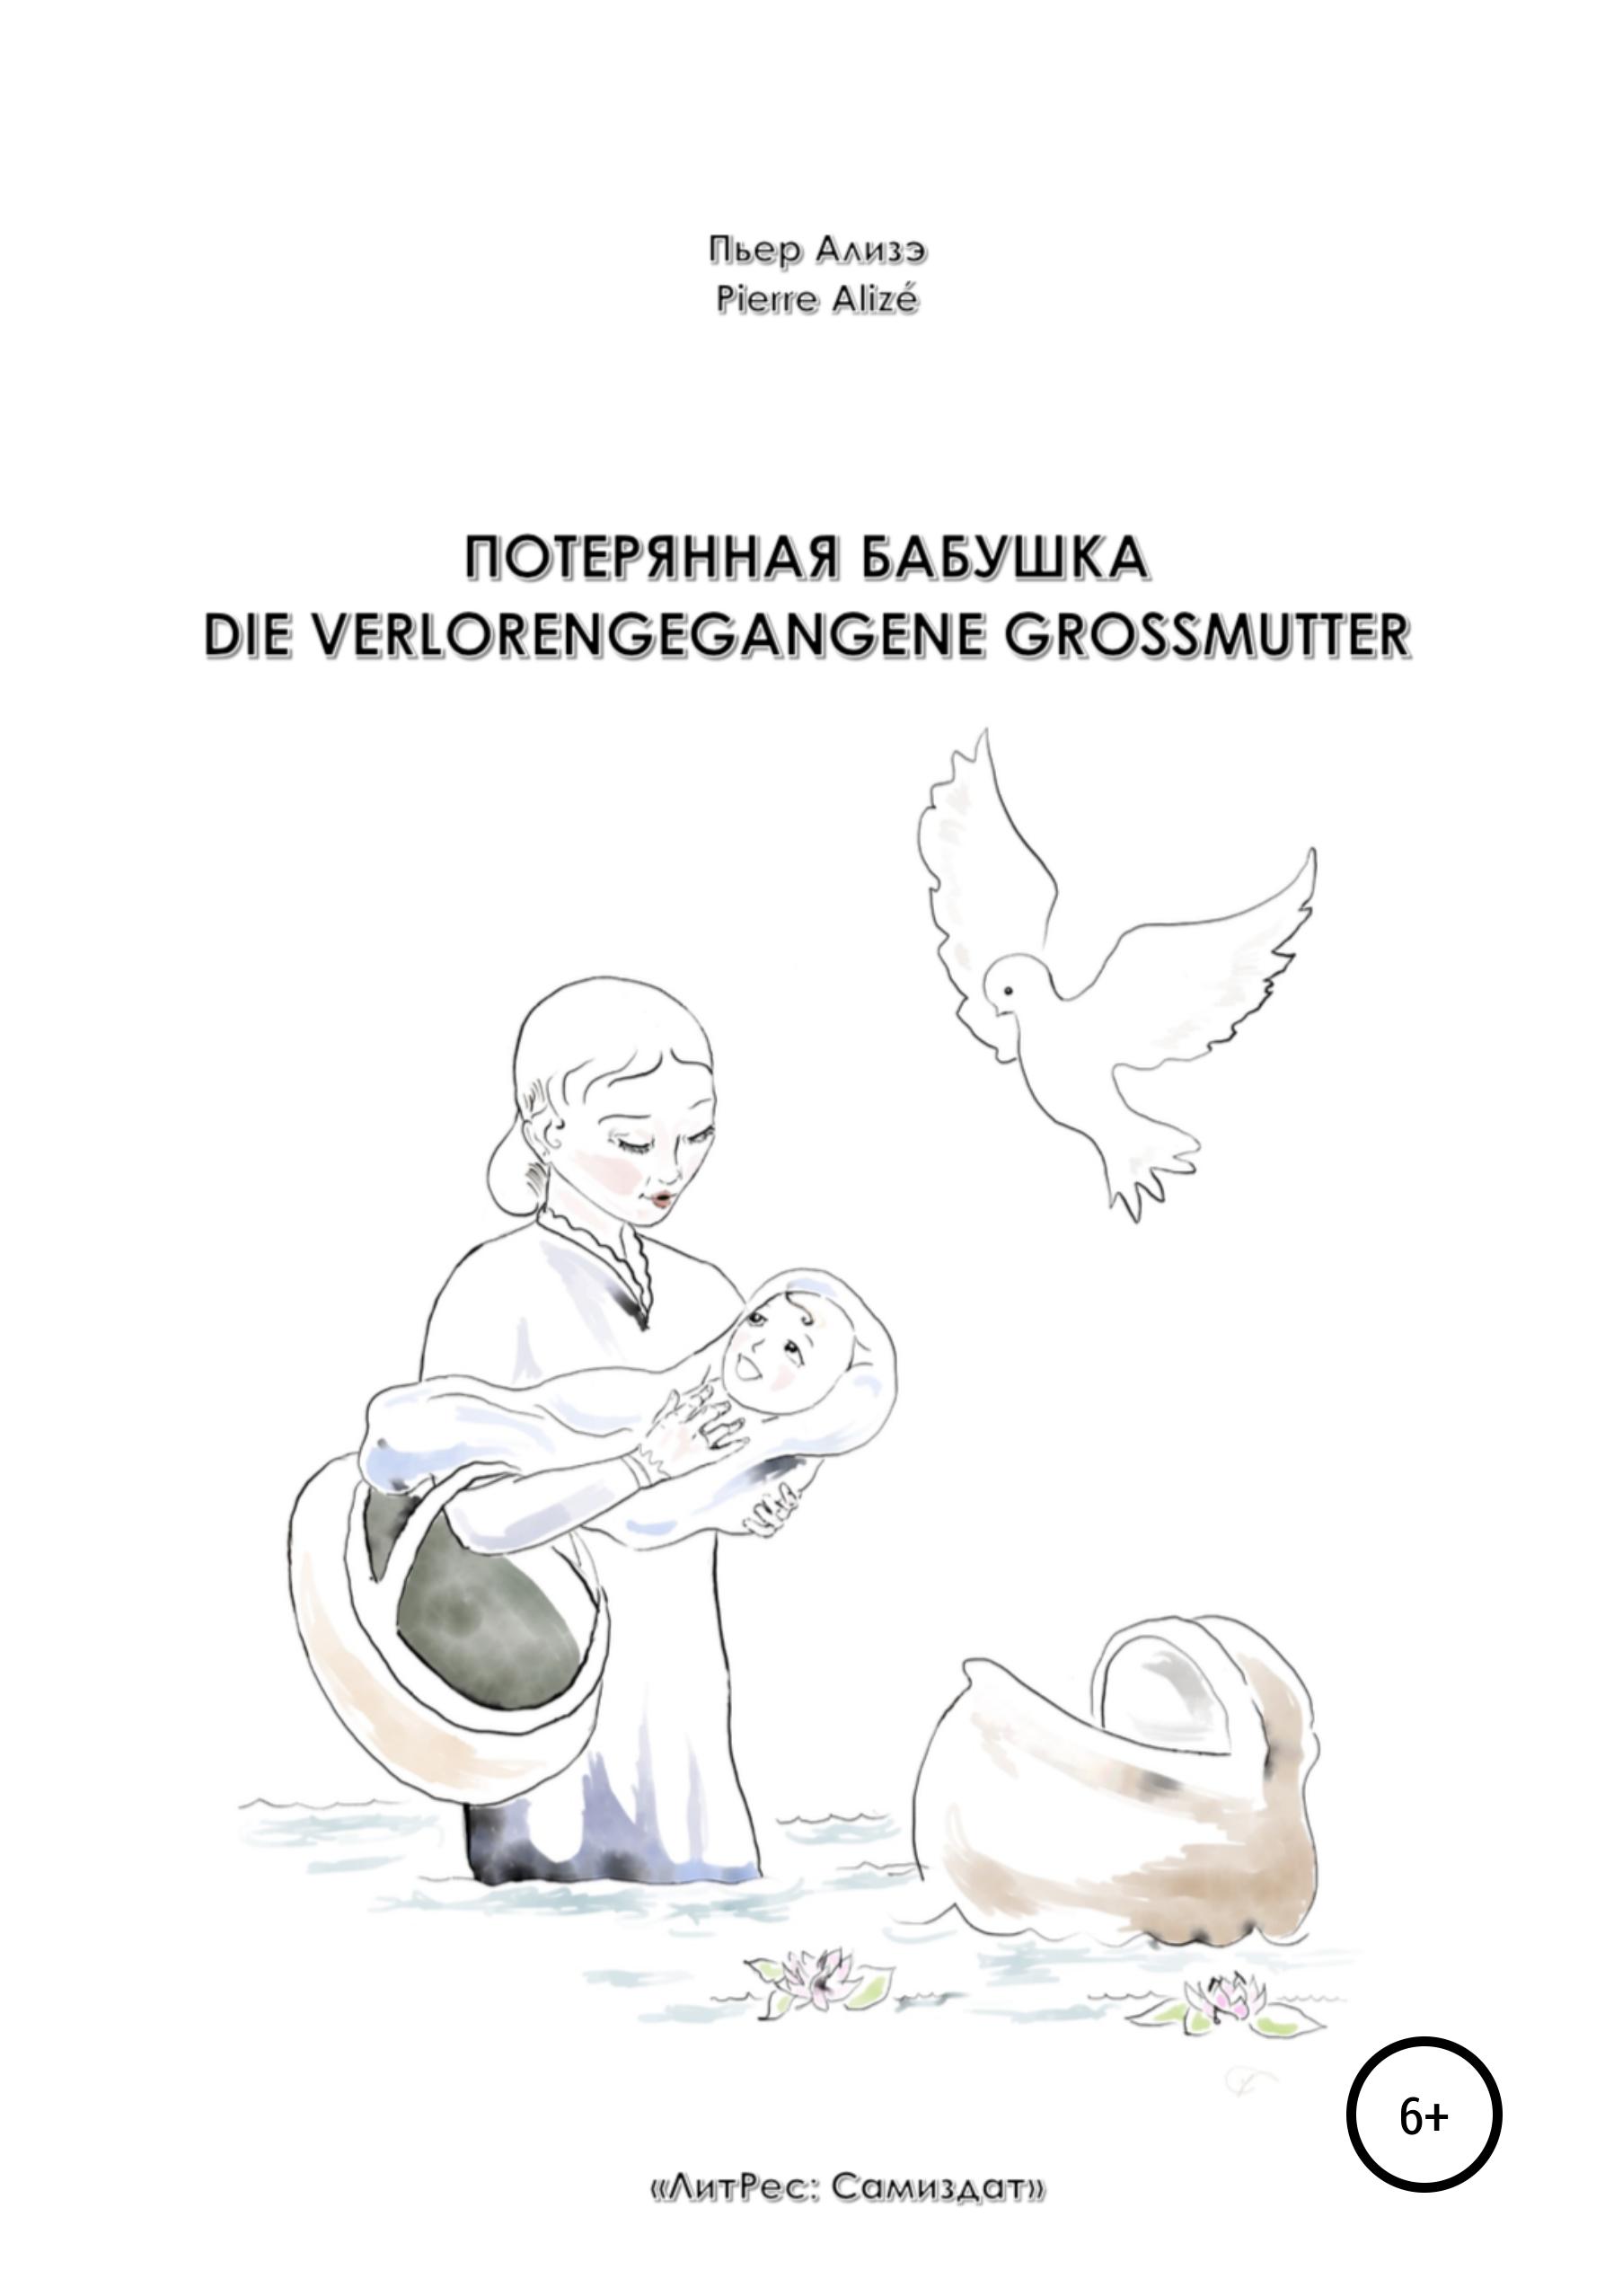 Потерянная бабушка – Die verlorengegangene Grossmutter